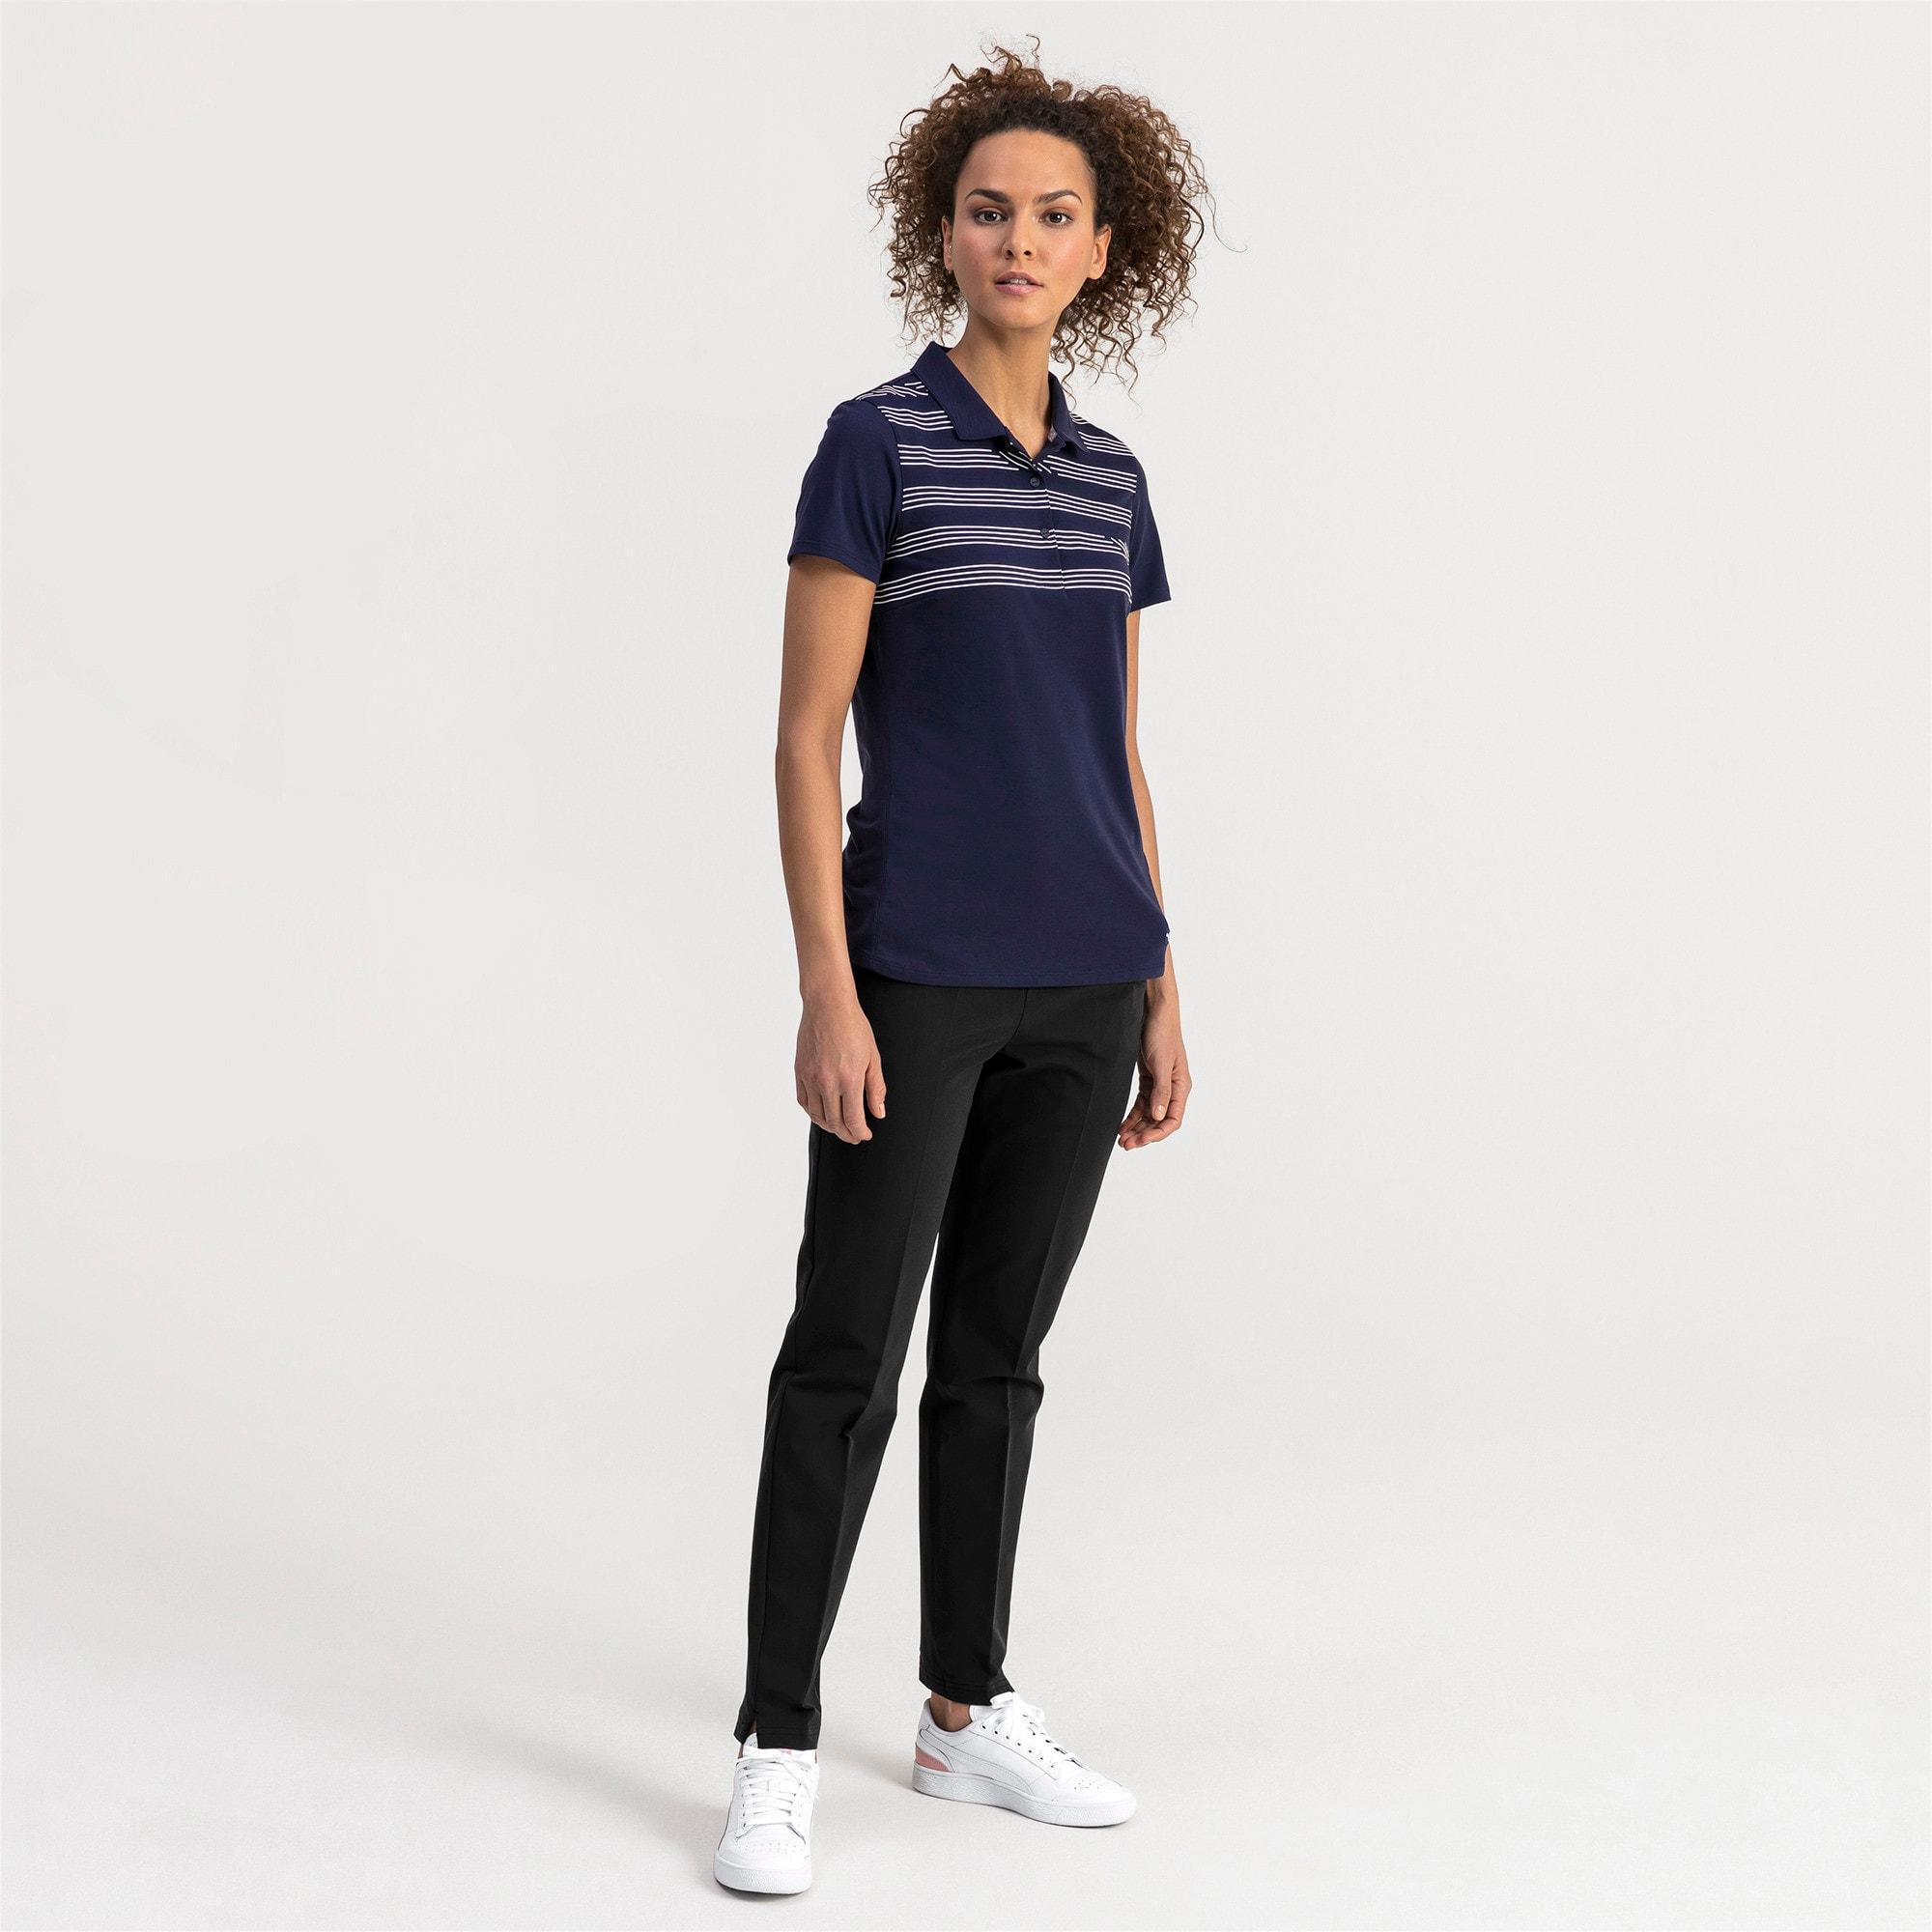 Thumbnail 3 of On Par Women's Golf Polo, Peacoat, medium